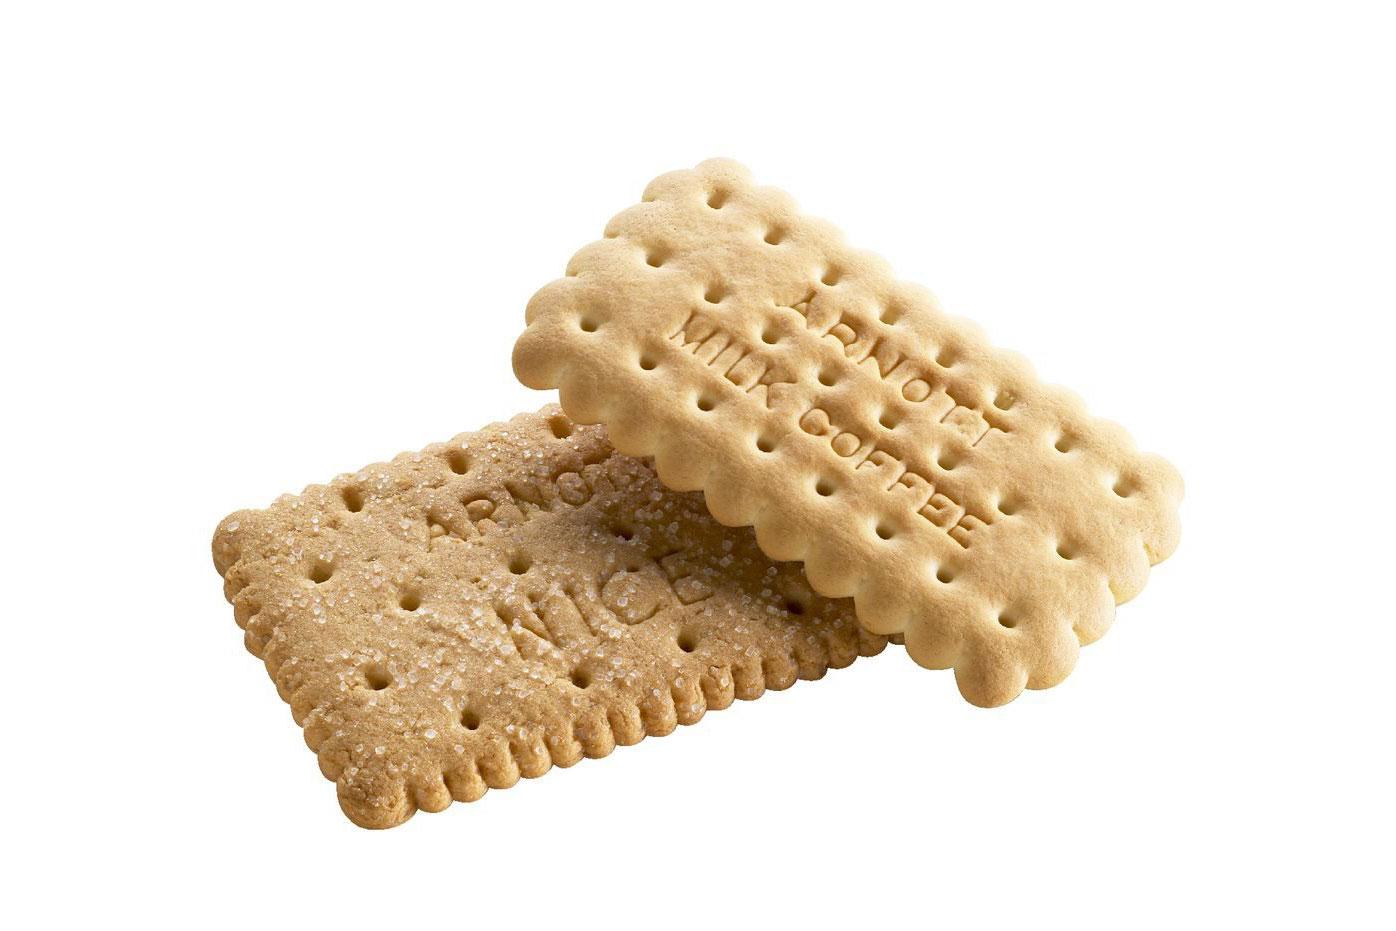 Arnott's Milk Coffee biscuit: Half a teaspoon of sugar